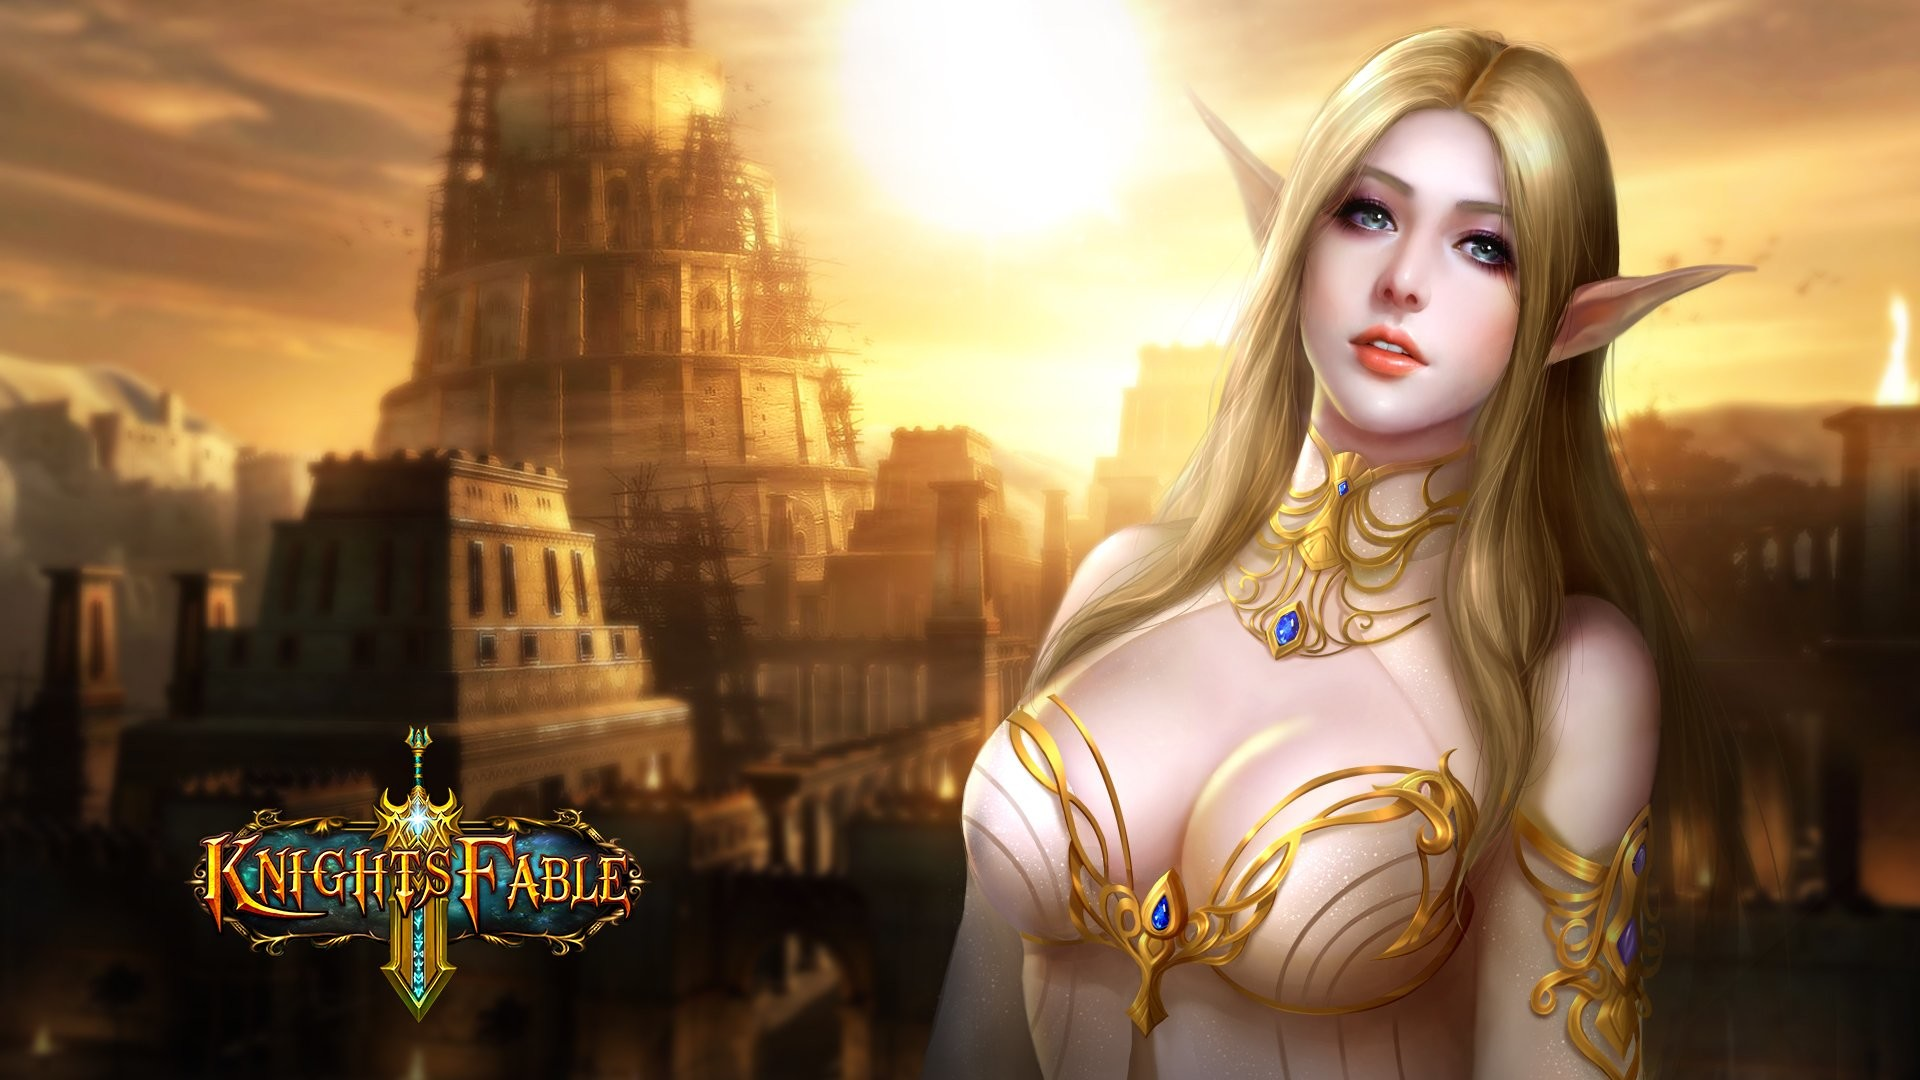 KNIGHTS FABLE fantasy mmo rpg online hero heroes King Arthur action  adventure fighting poster elf elves